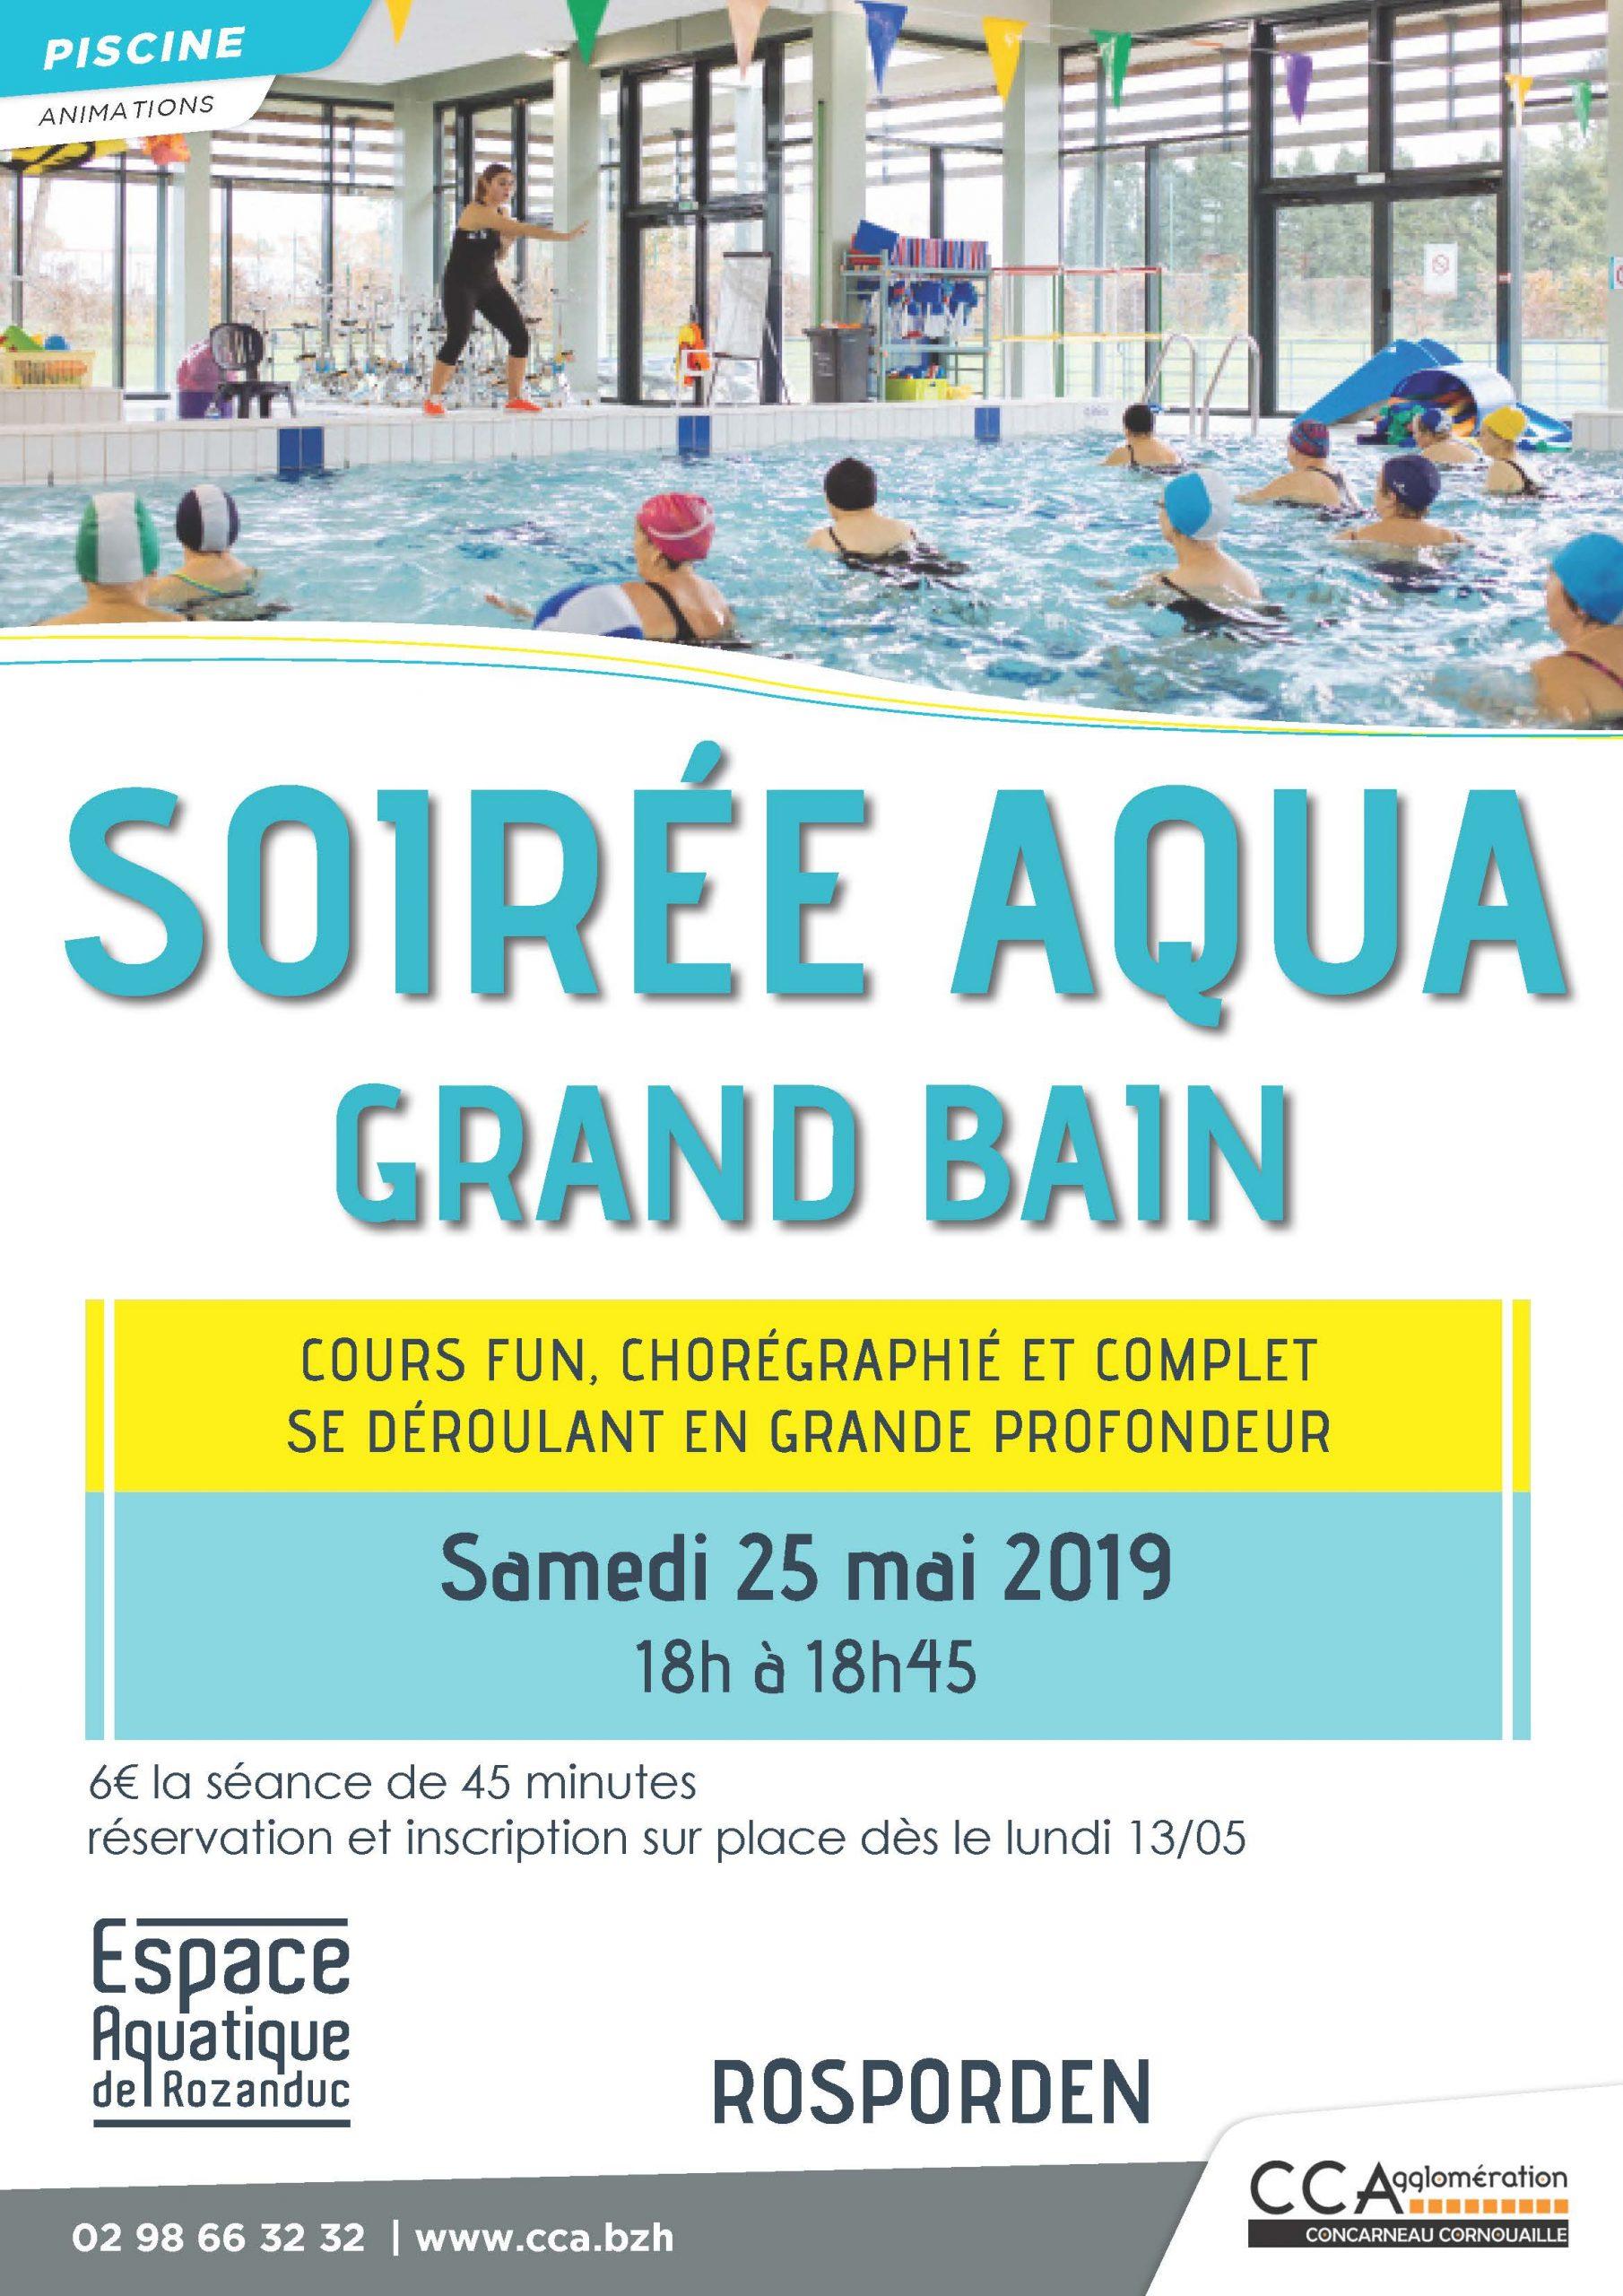 Soirée Aqua-Grand Bain 25 Mai 2019 À Rozanduc concernant Piscine Concarneau Horaires